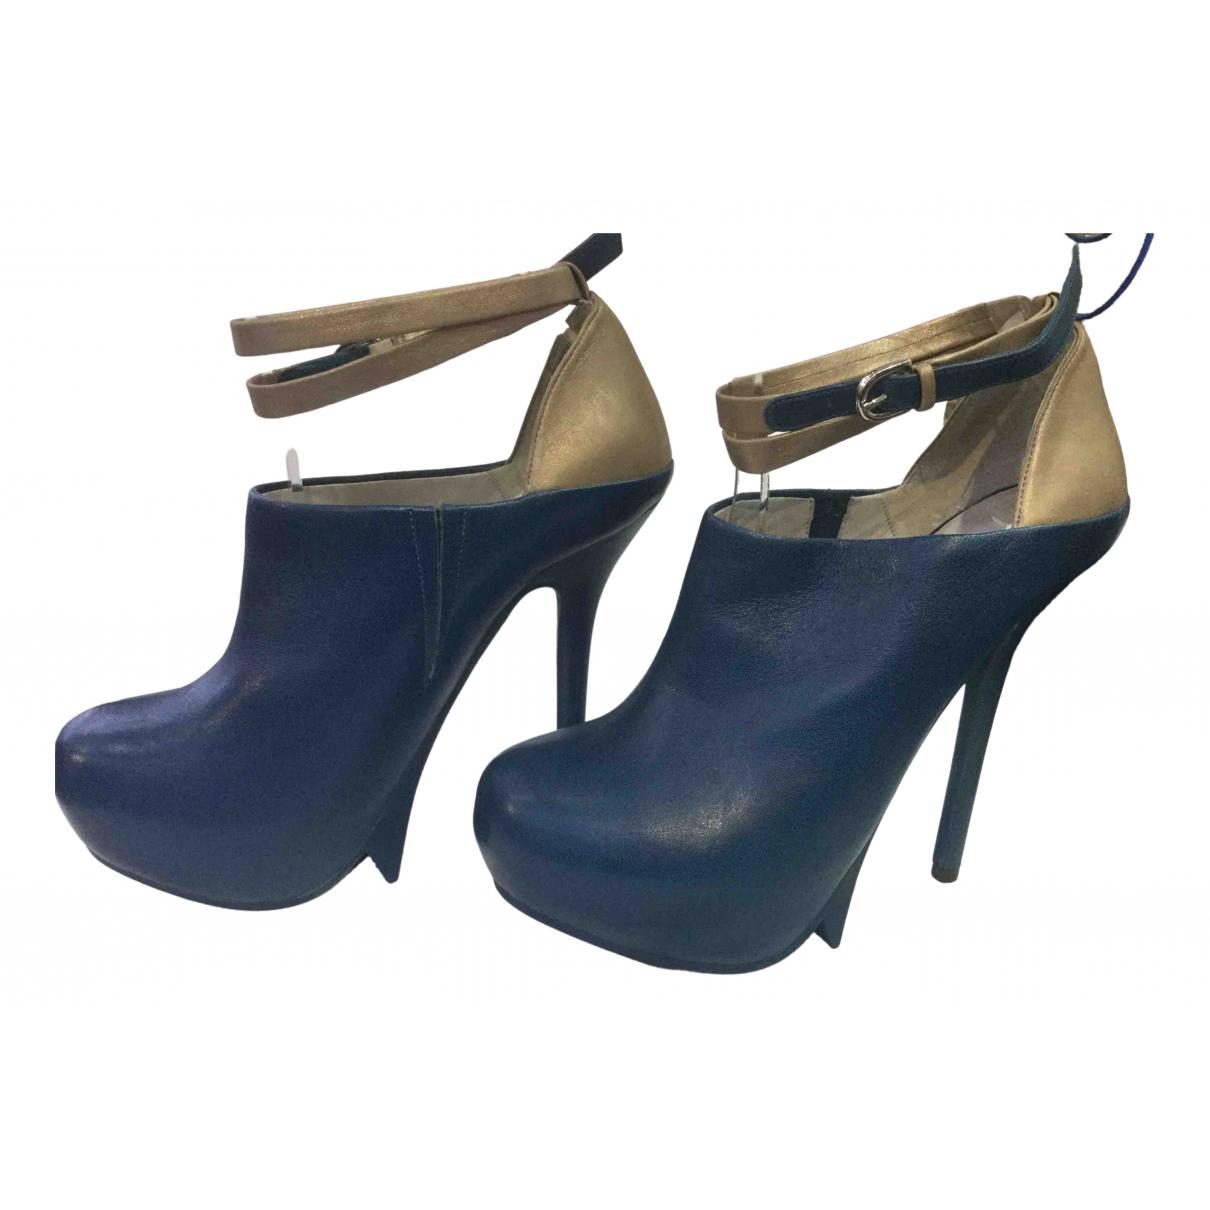 Camilla Skovgaard \N Blue Leather Heels for Women 38 EU